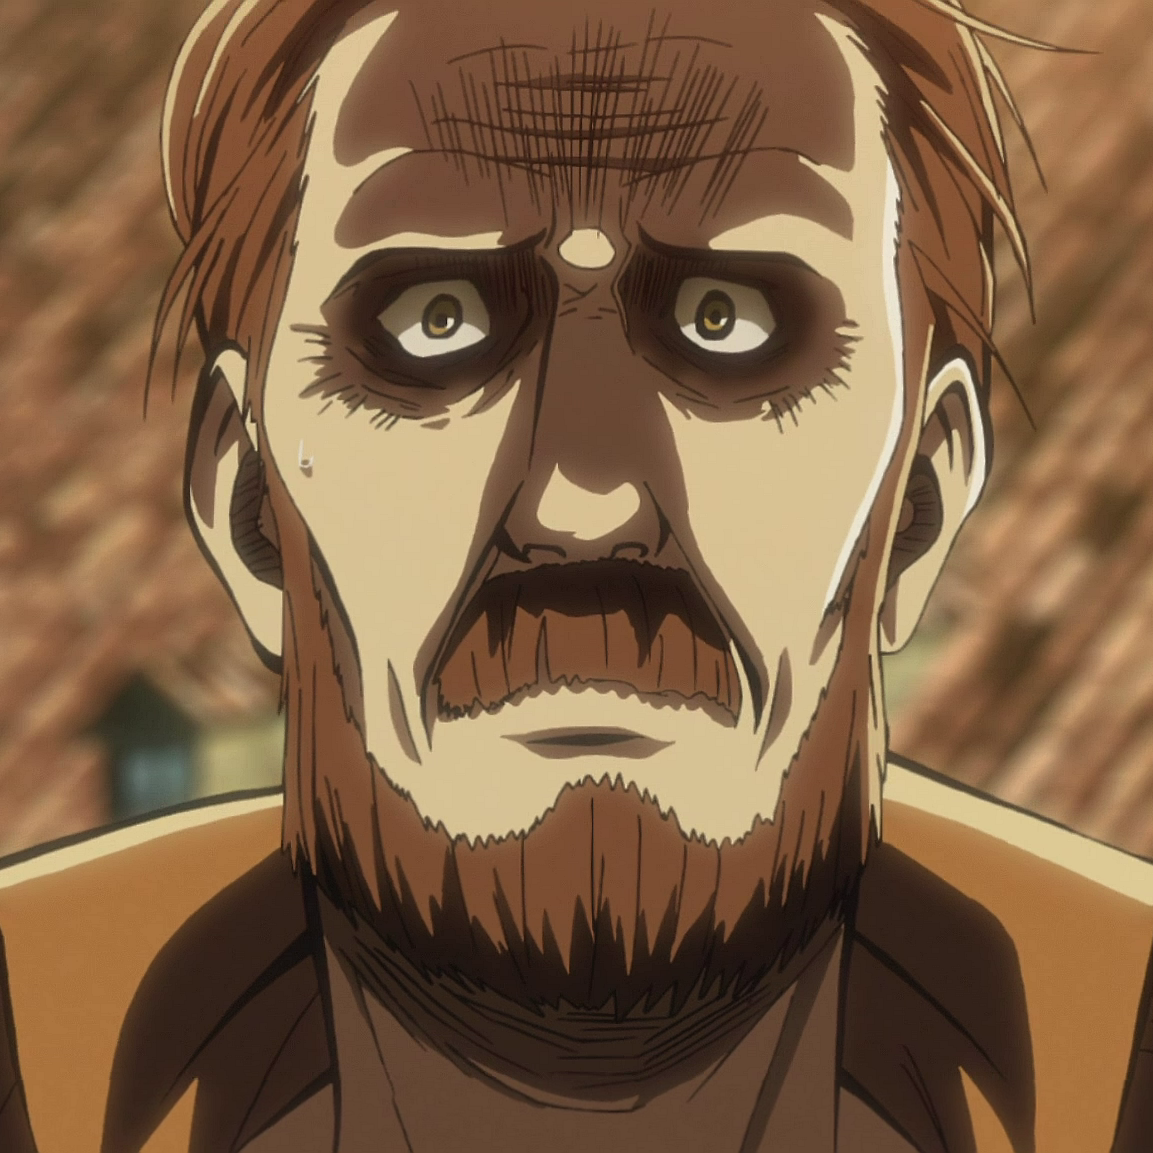 Kitz Woermann (Anime) | Attack on Titan Wiki | FANDOM powered by Wikia